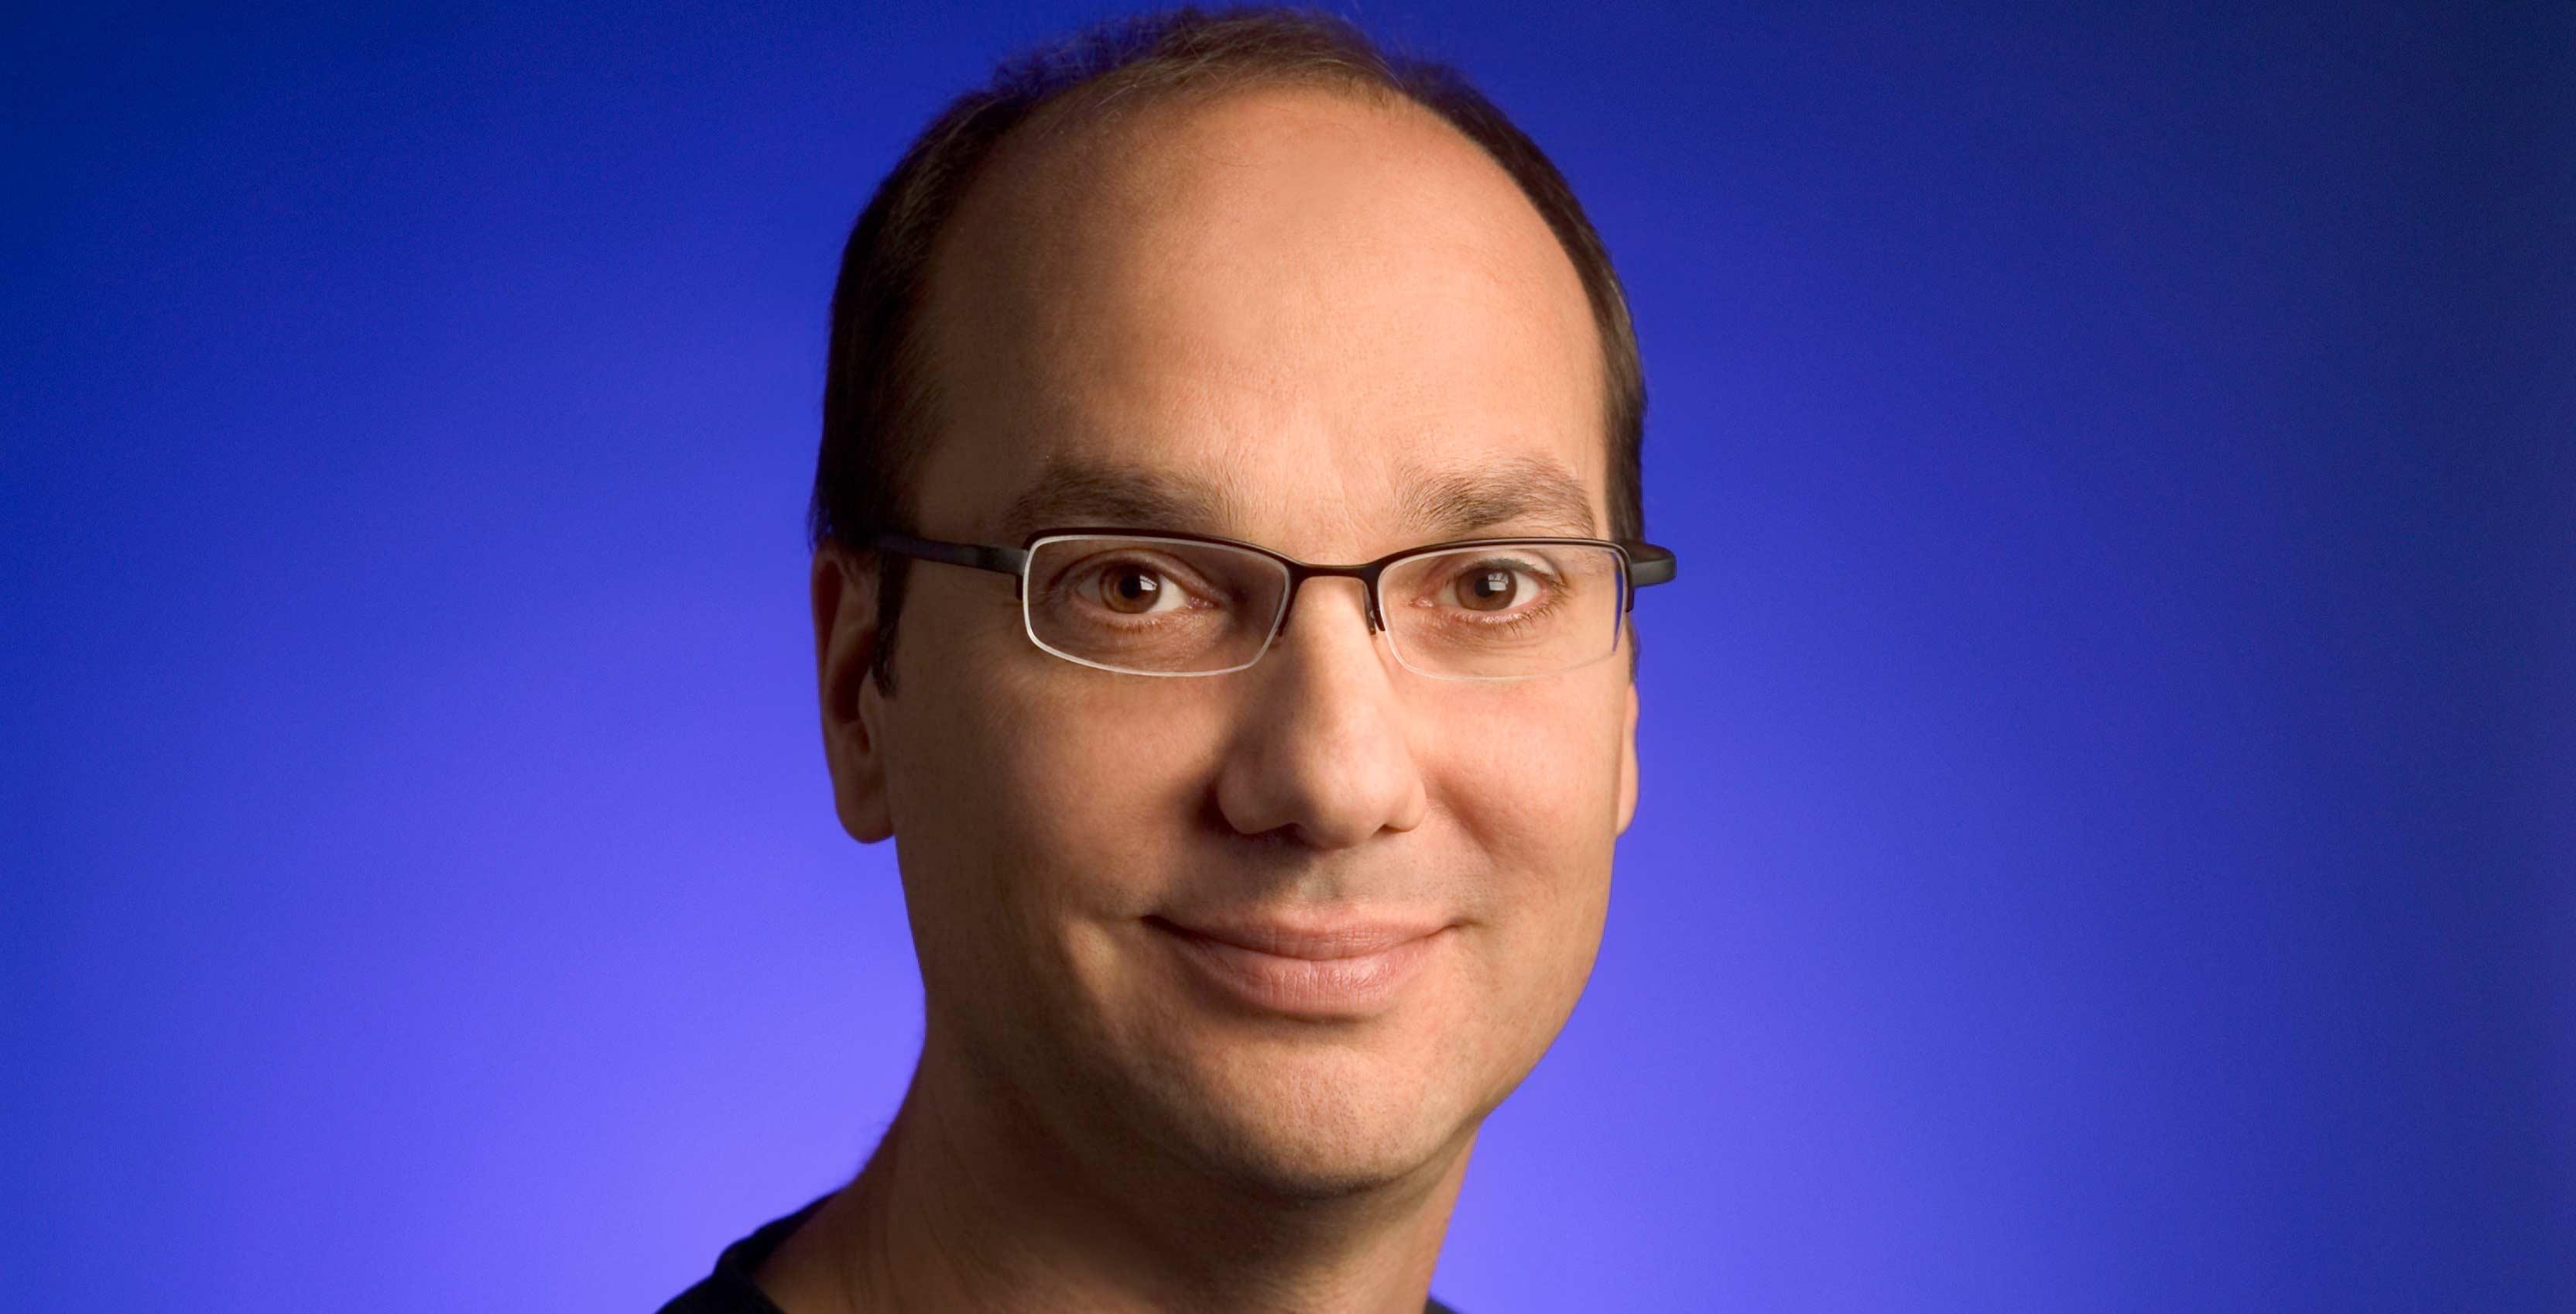 Andy Rubin headshot